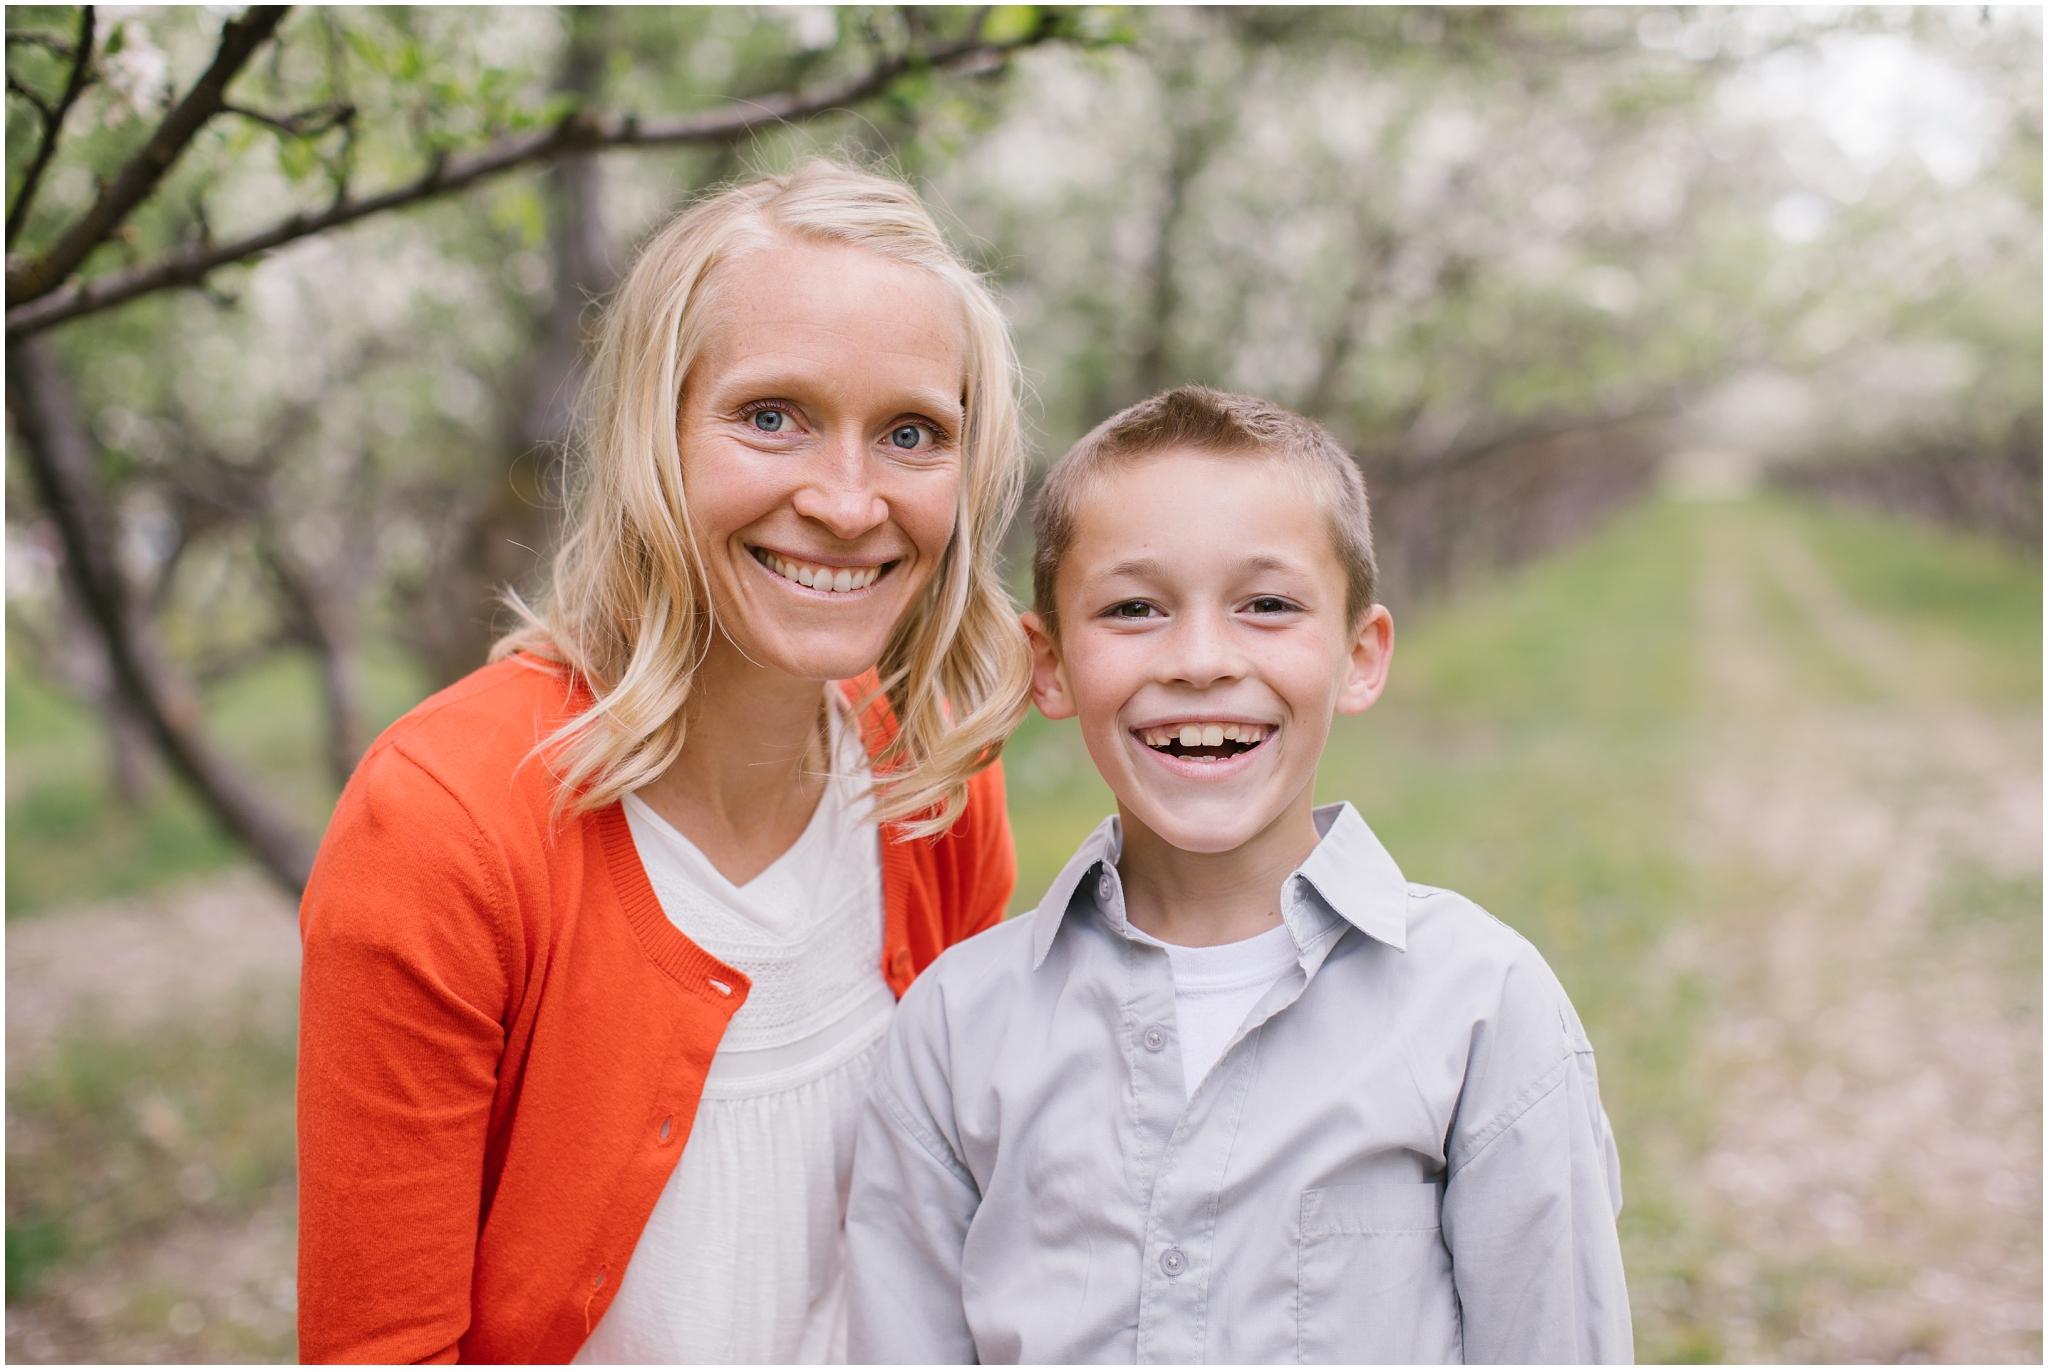 Millar-62_Lizzie-B-Imagery-Utah-Family-Photographer-Salt-Lake-City-Park-City-utah-state-hospital.jpg